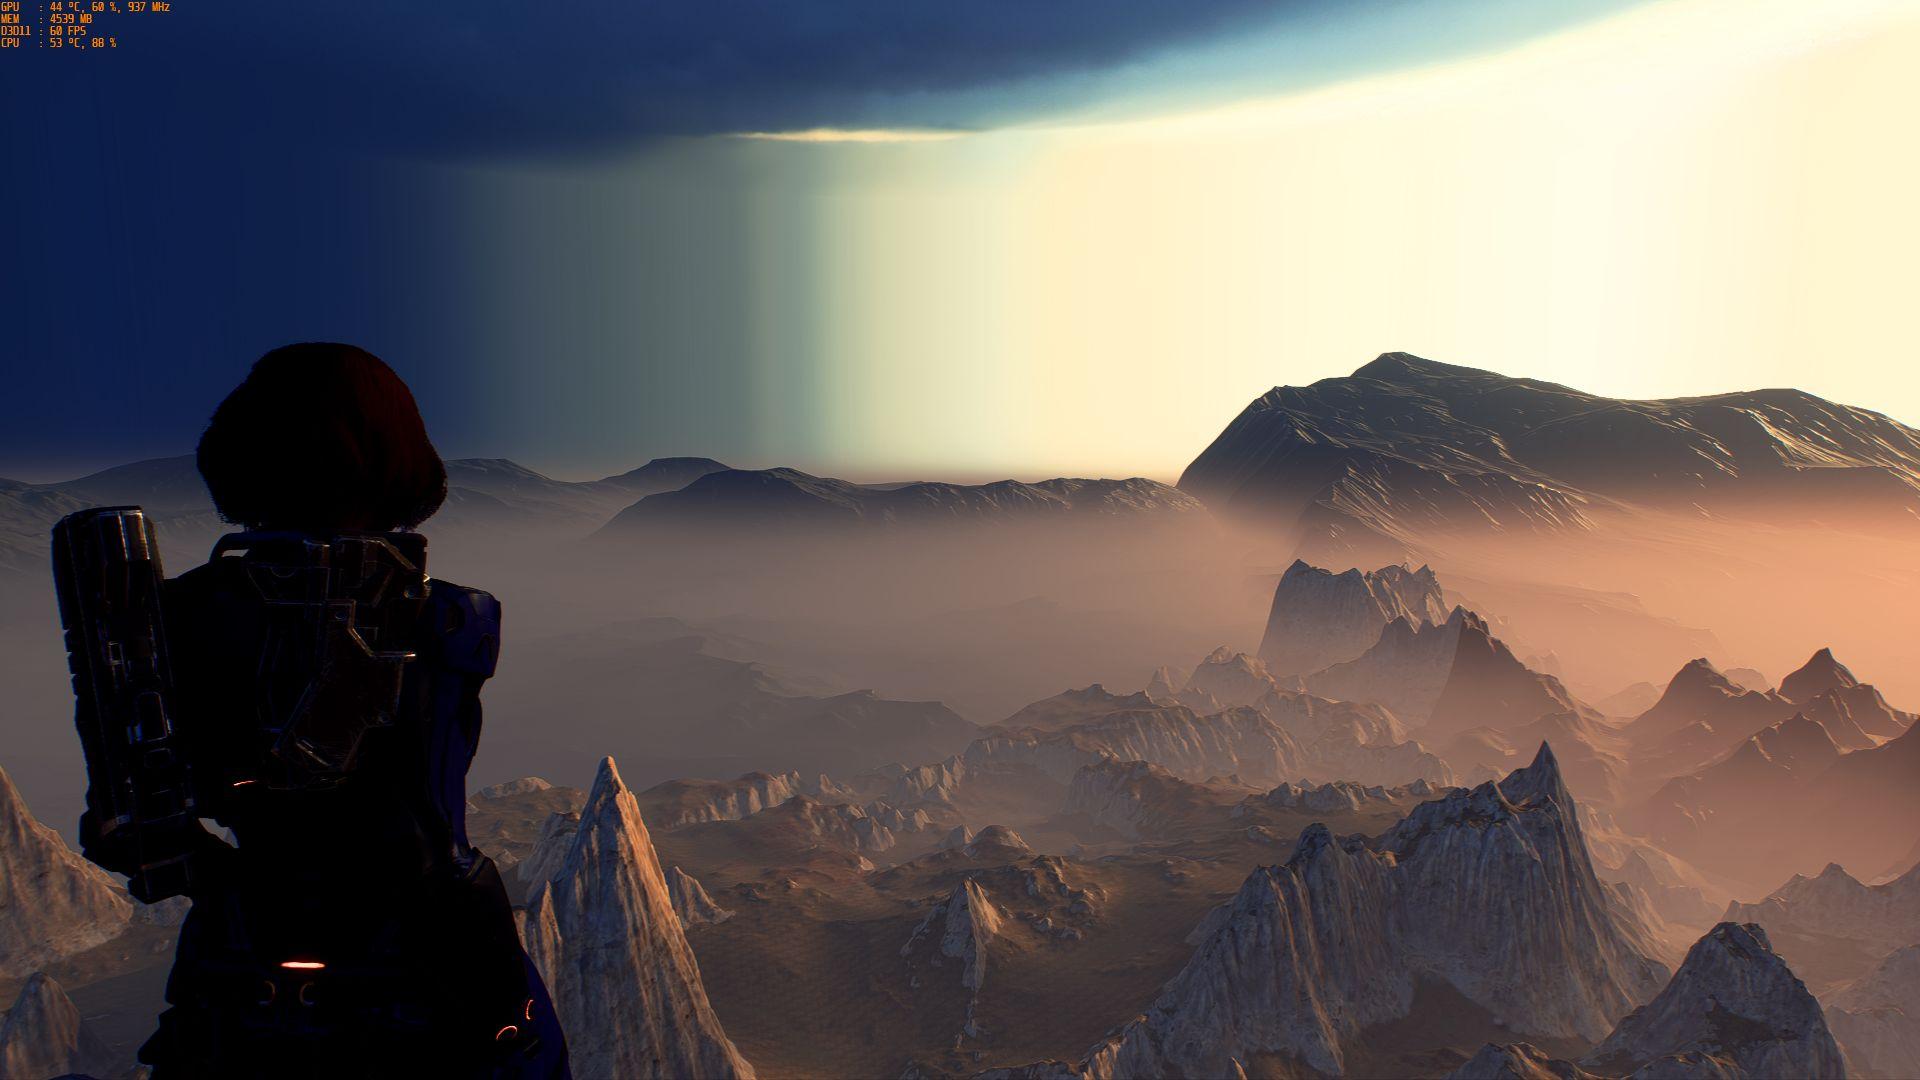 Mass Effect Andromeda Screenshot 2017.07.24 - 21.05.29.80.jpg - Mass Effect: Andromeda